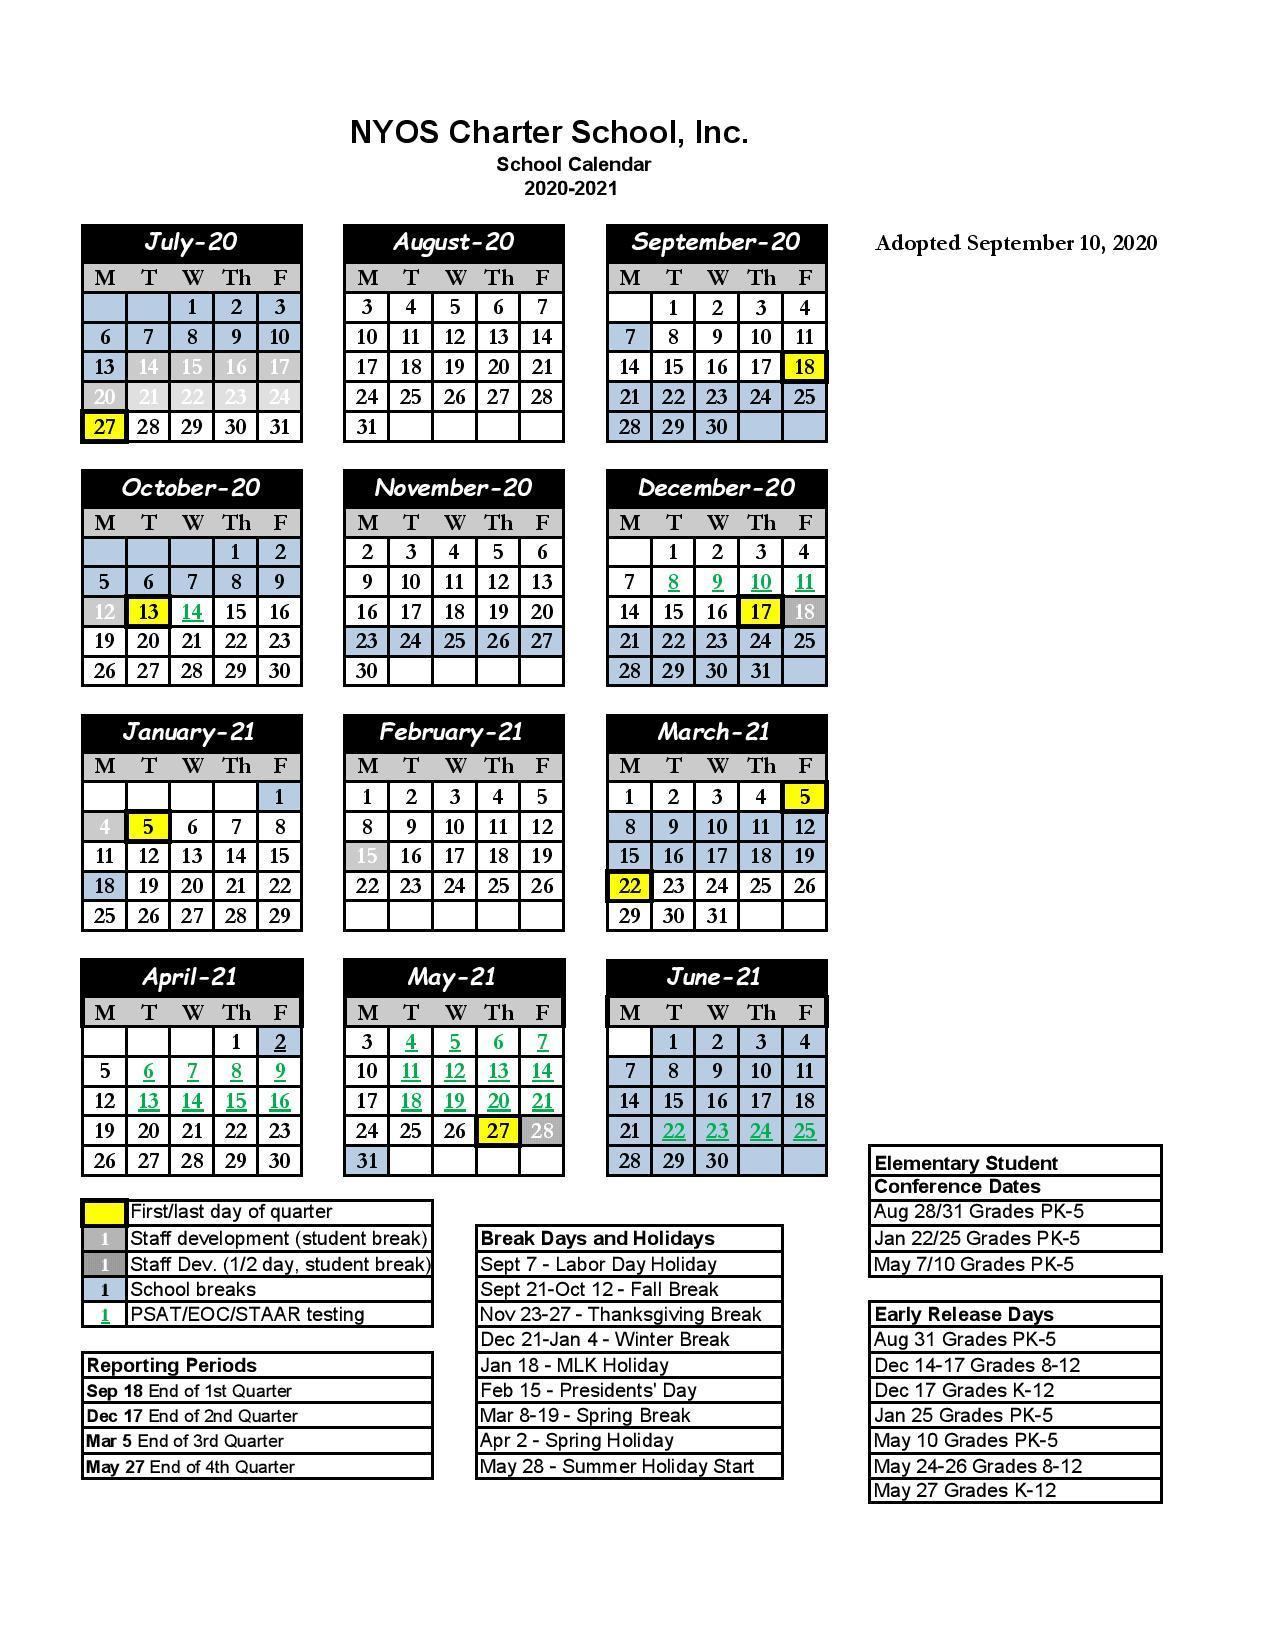 School Calendars   Miscellaneous   NYOS Charter School